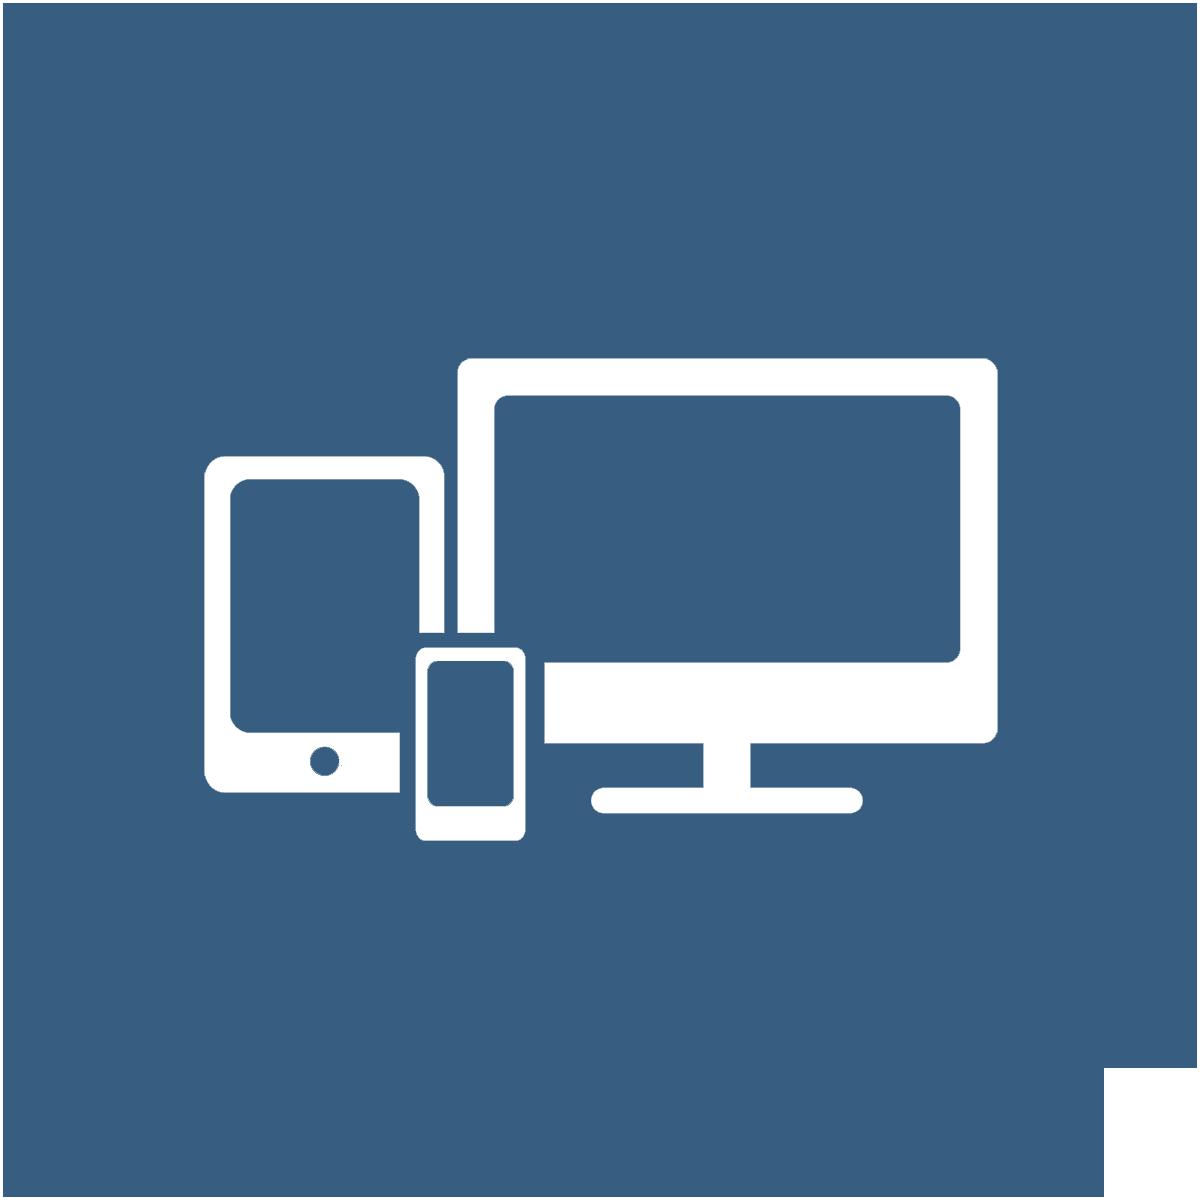 responsive-web-design-logo